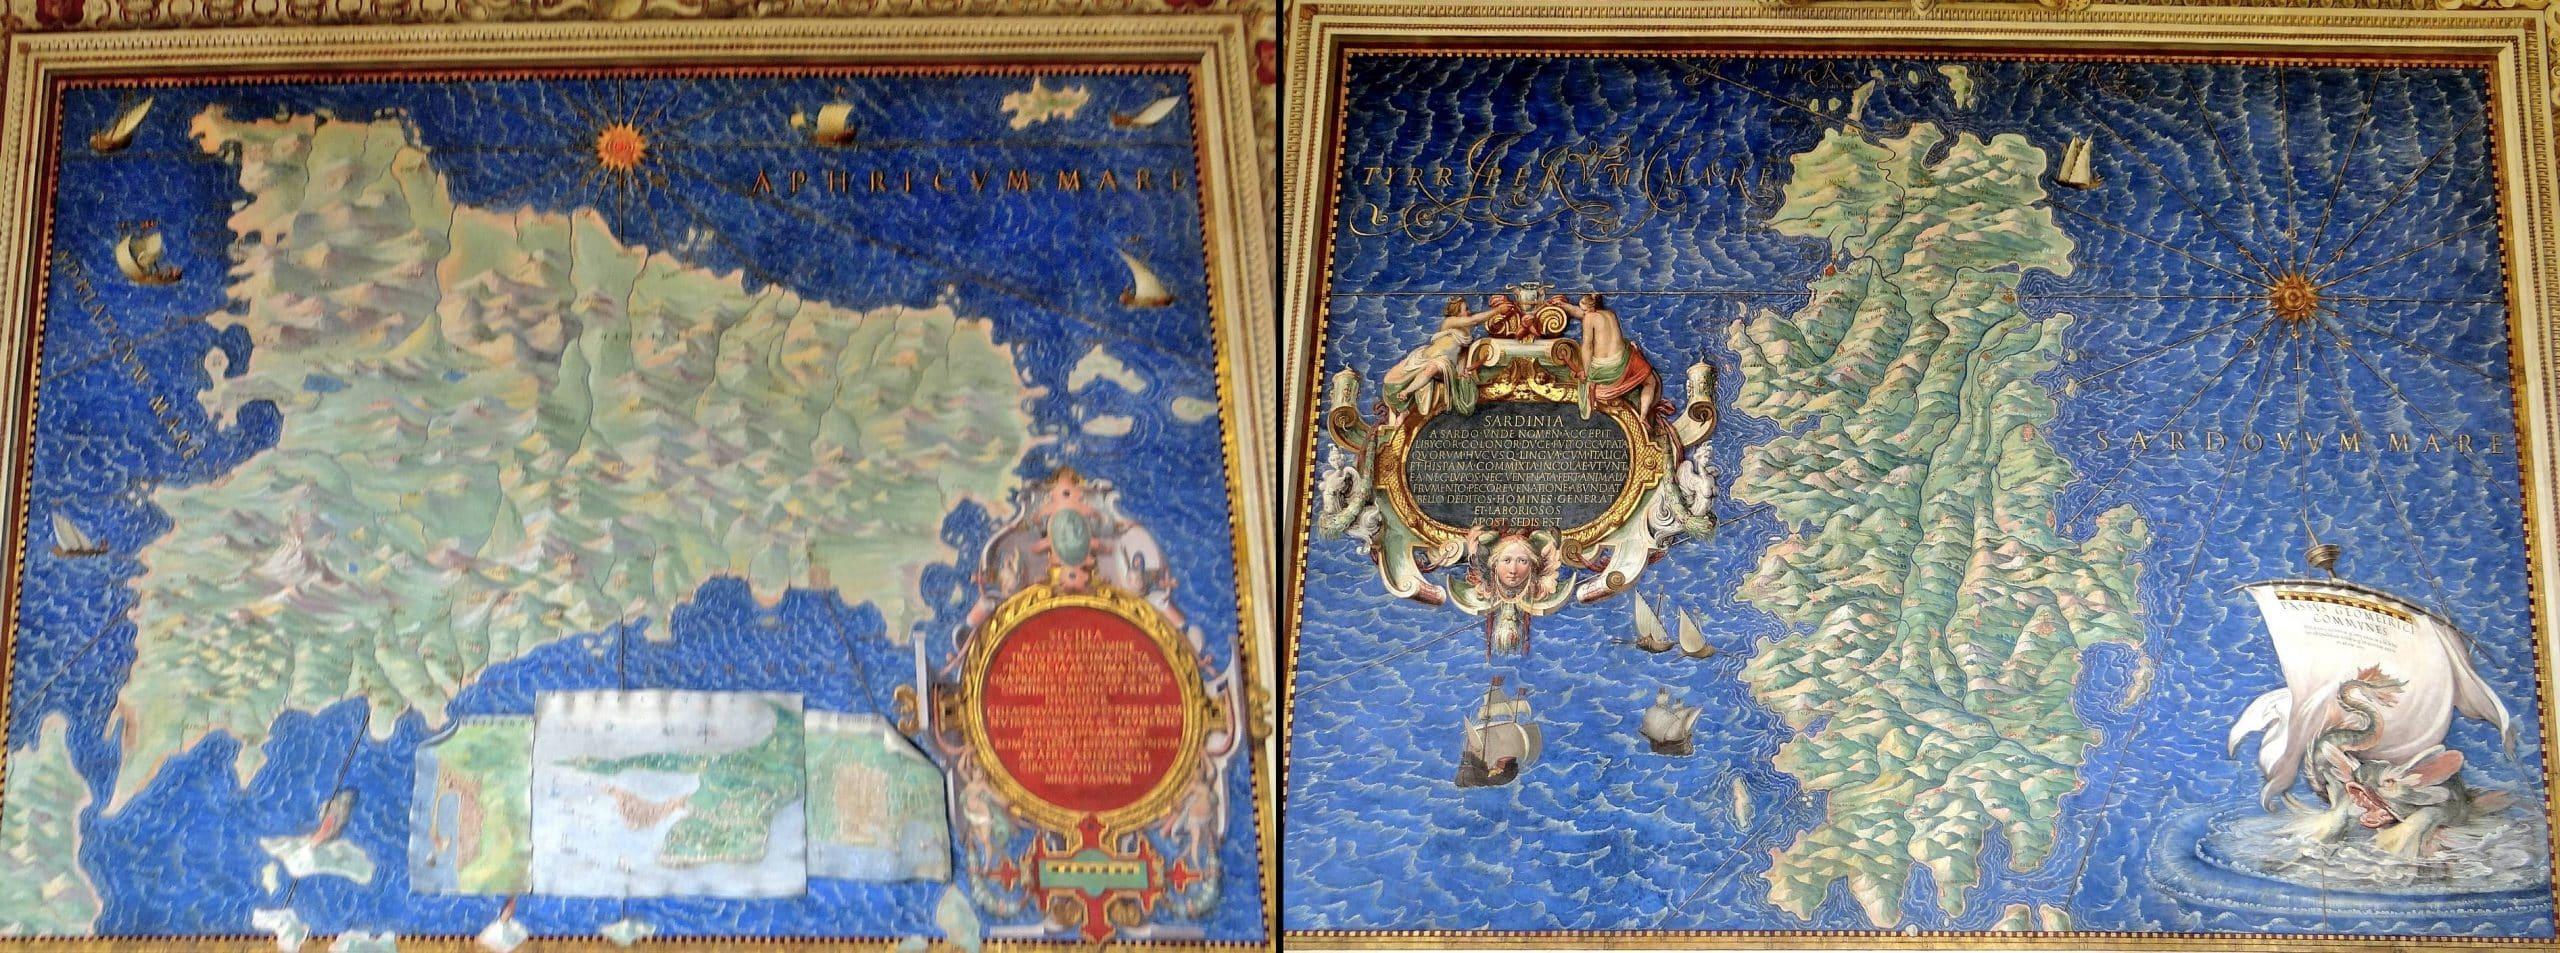 Vatikan Müzesi Haritalar Galerisi